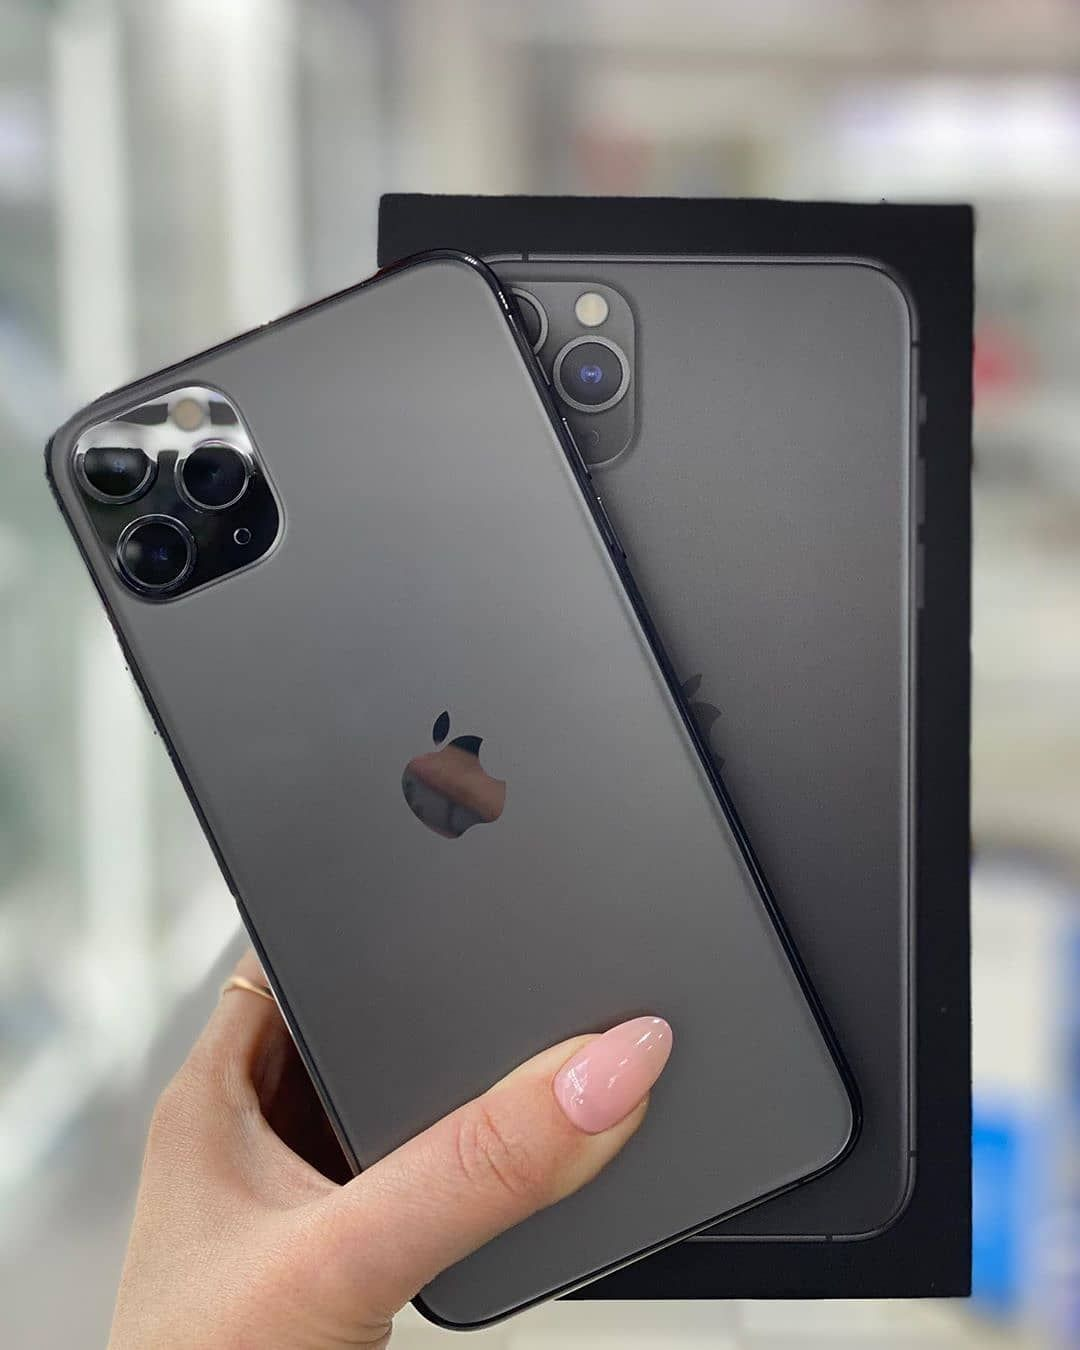 Iphone 11 Pro Iphone Apple Iphone Apple Smartphone